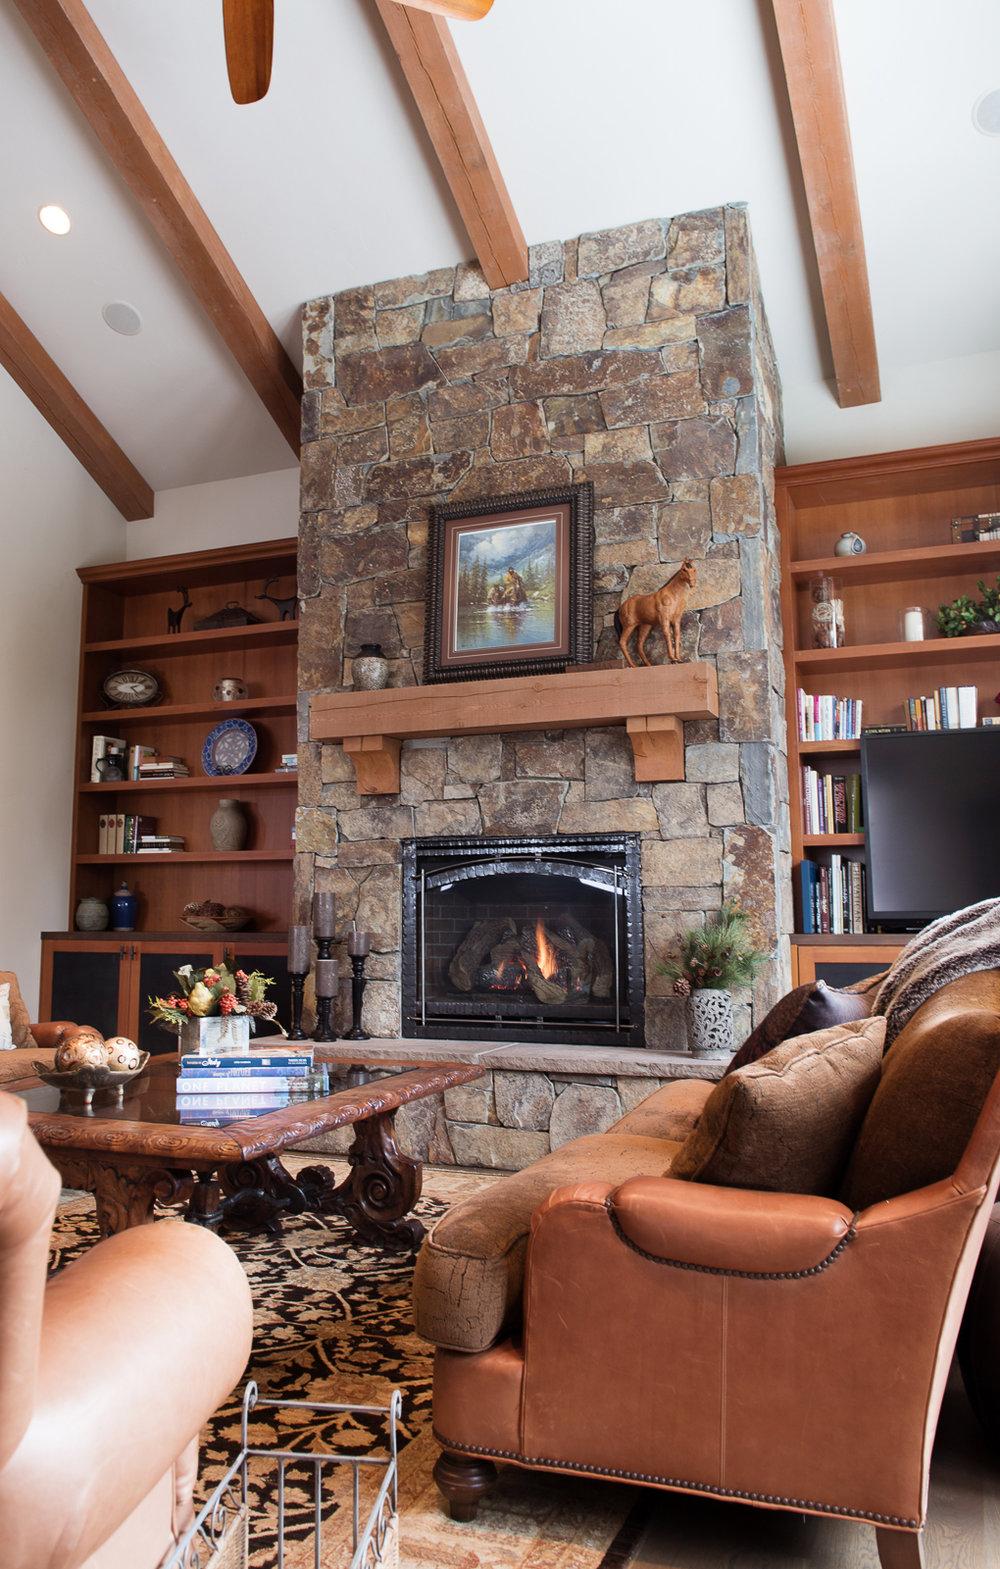 Woodworks-West-Bozeman-Montana-Builder-Cabinetry-Remodel-New-Construction-3486.jpg